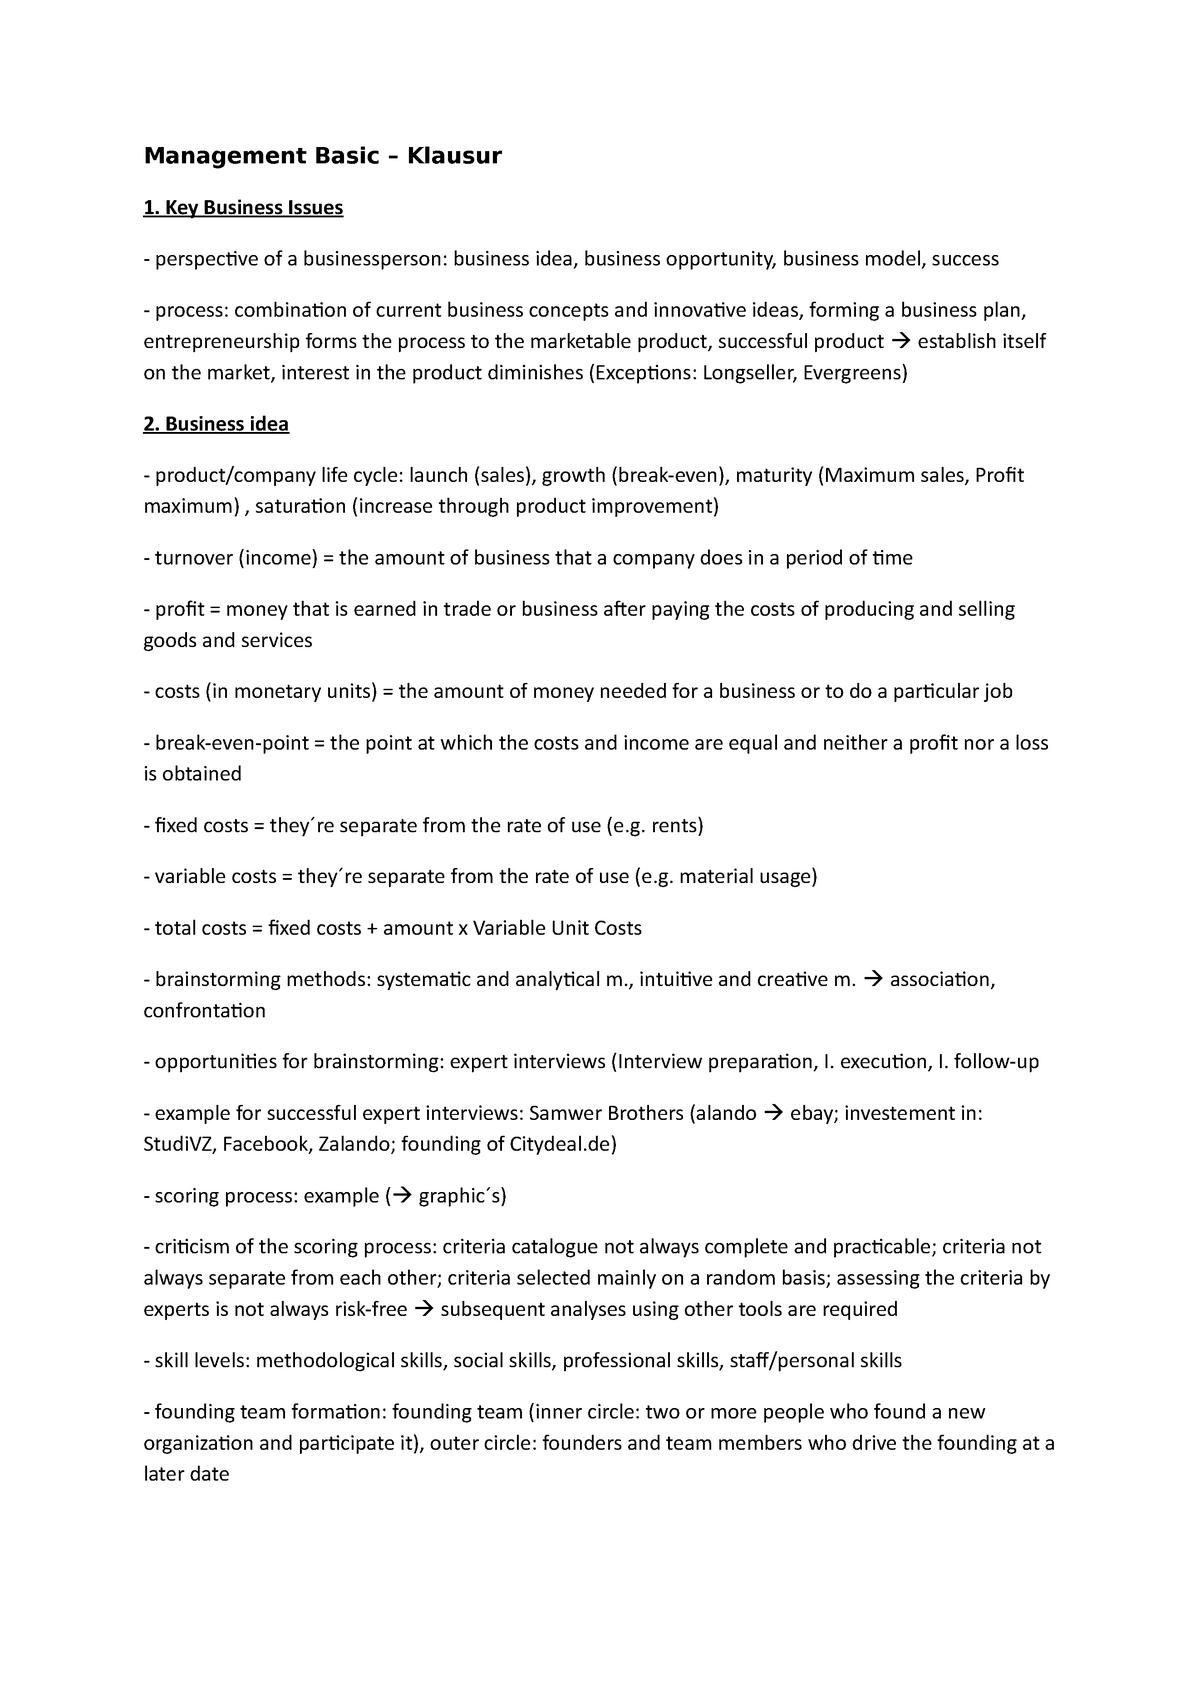 Management Basic Klausur (Englisch) - StuDocu